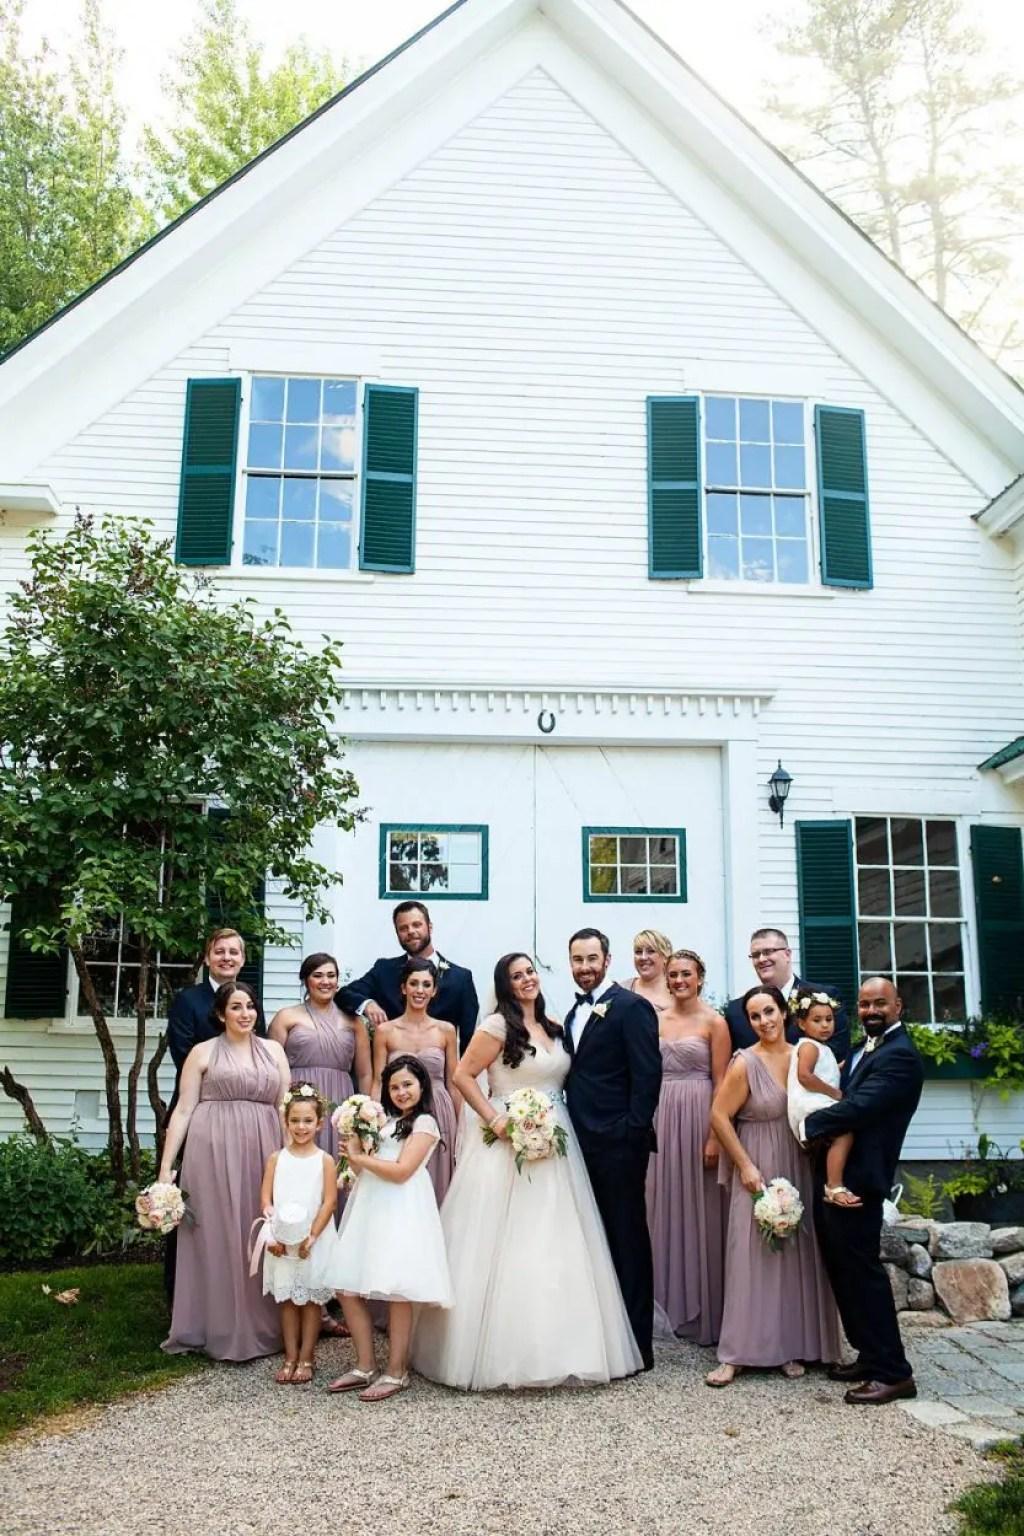 maine_wedding_venue_barn_M.Studios_061